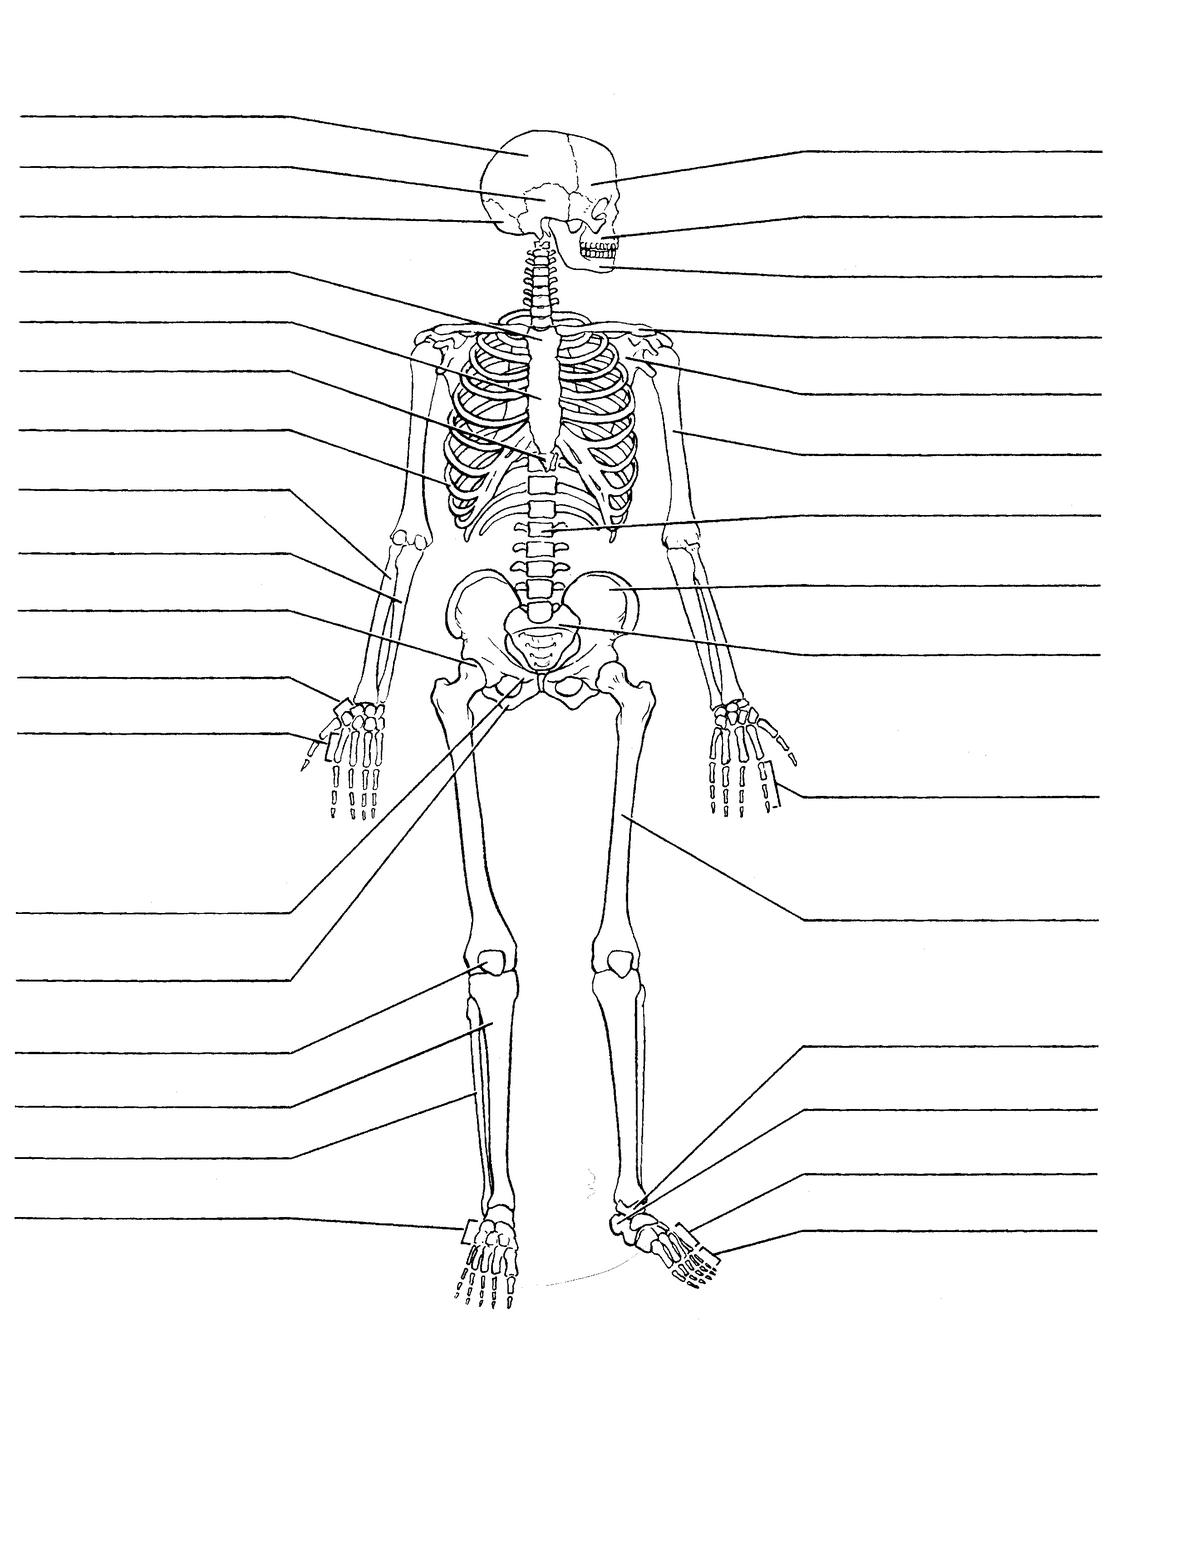 14. Skeletal system diagrams - unlabelled - StuDocuStuDocu